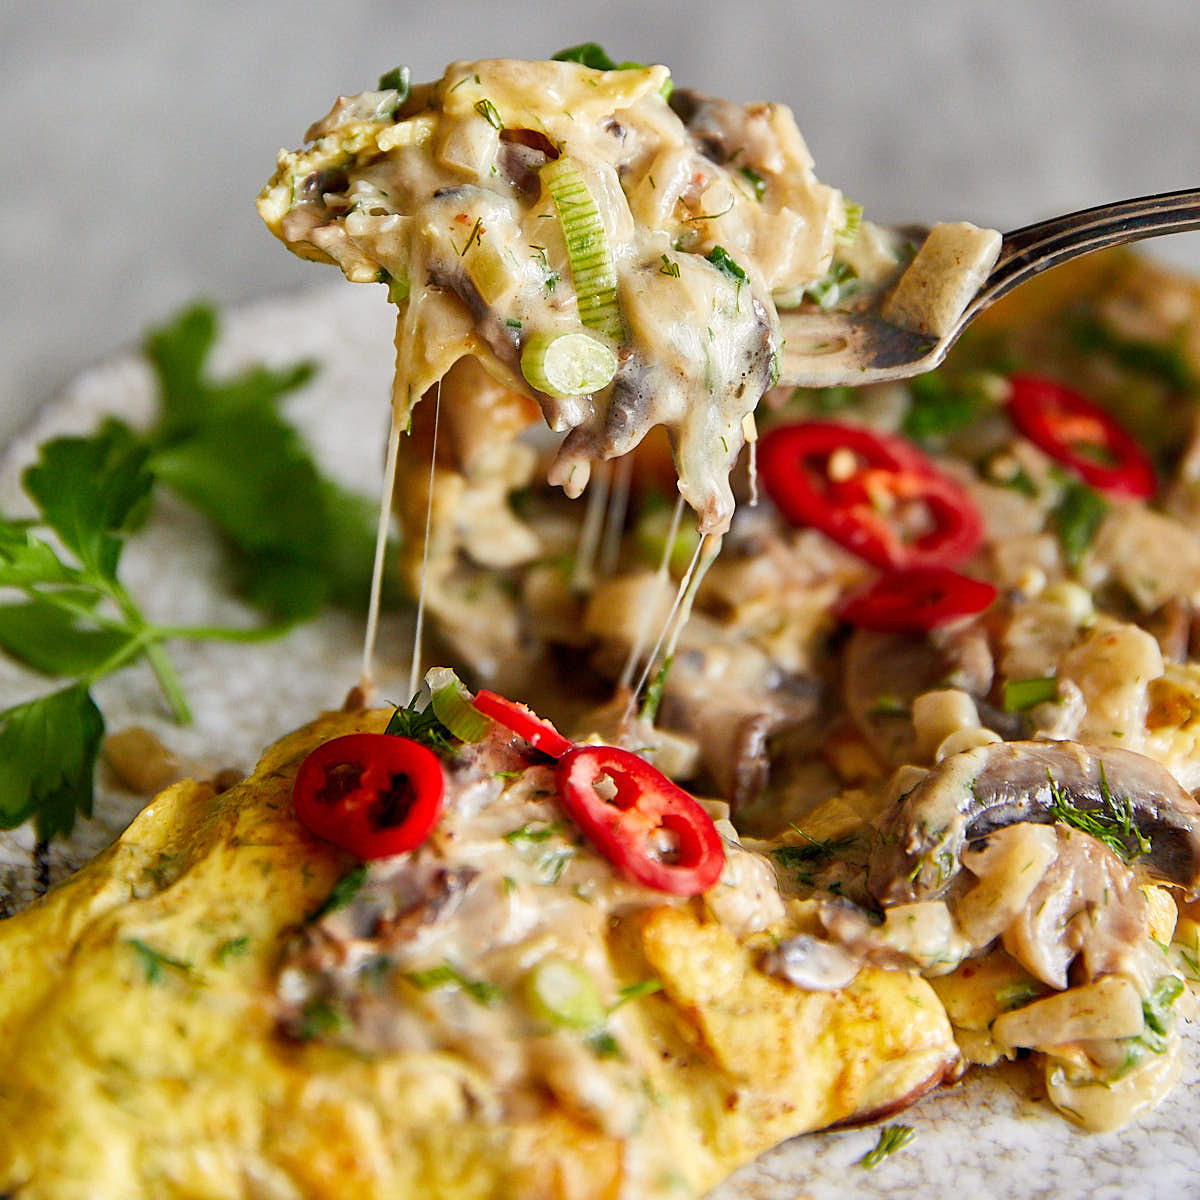 Mushroom Omelette with Creamy, Cheesy Mushroom Filling